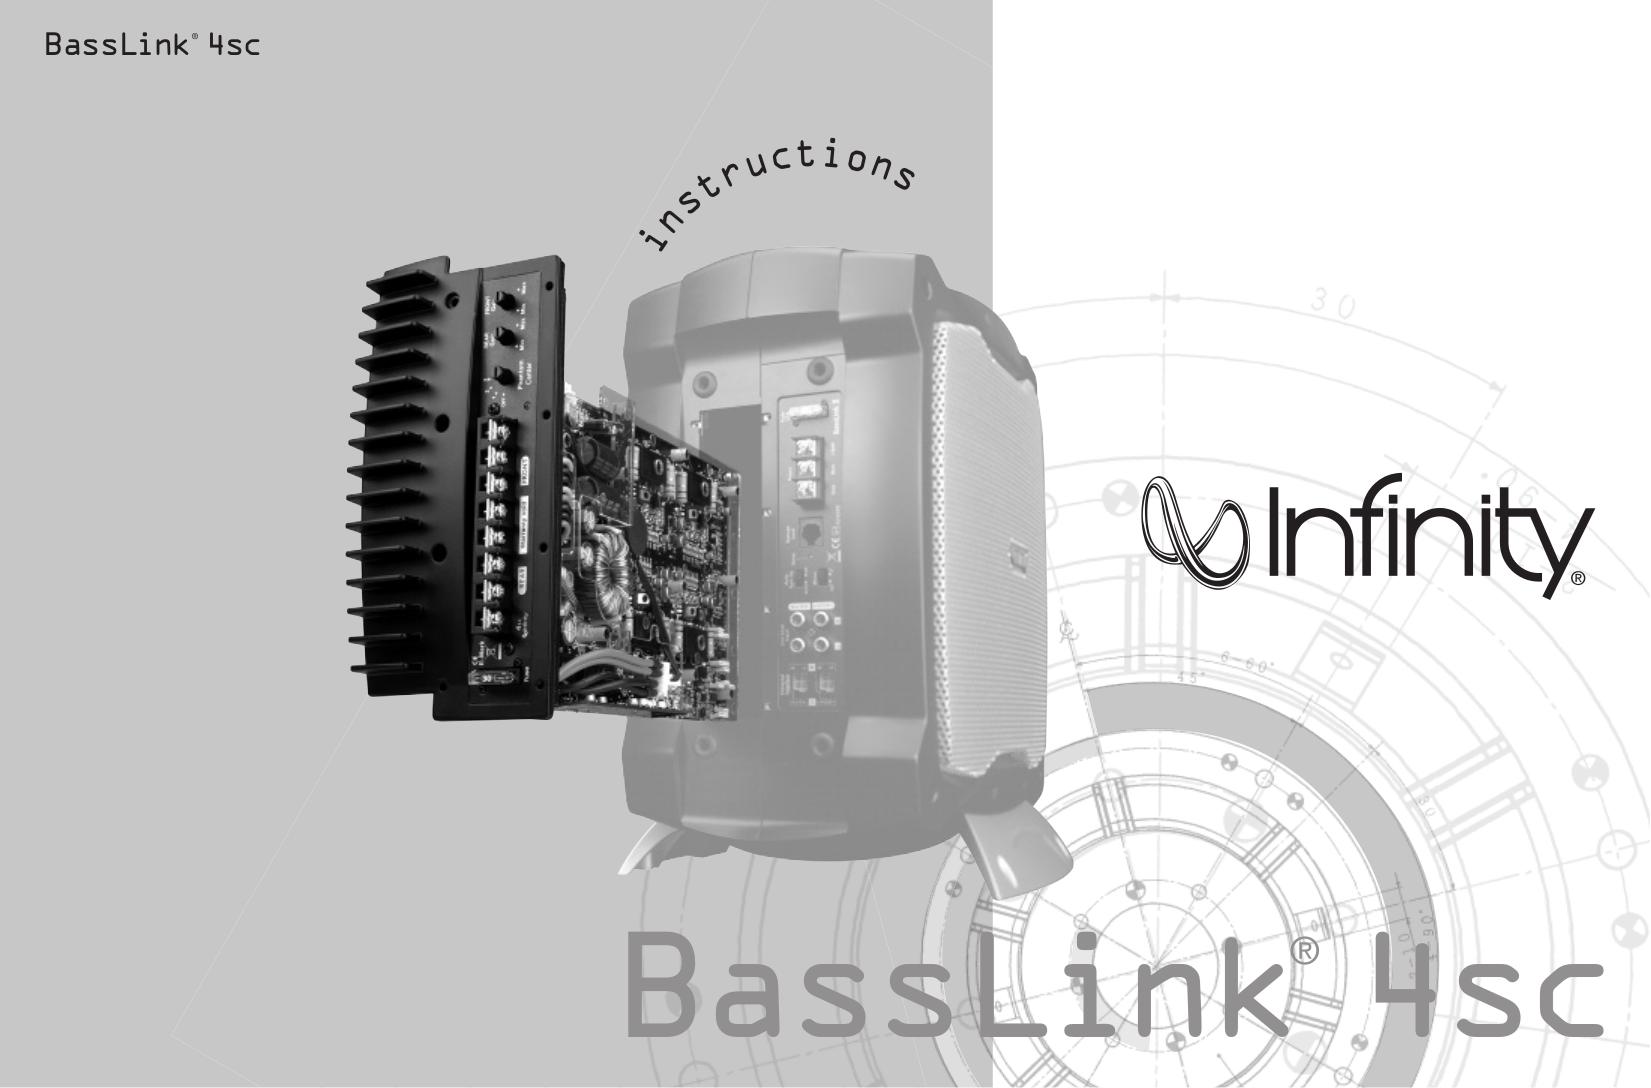 pdf for Infinity Car Amplifier Basslink 4SC manual